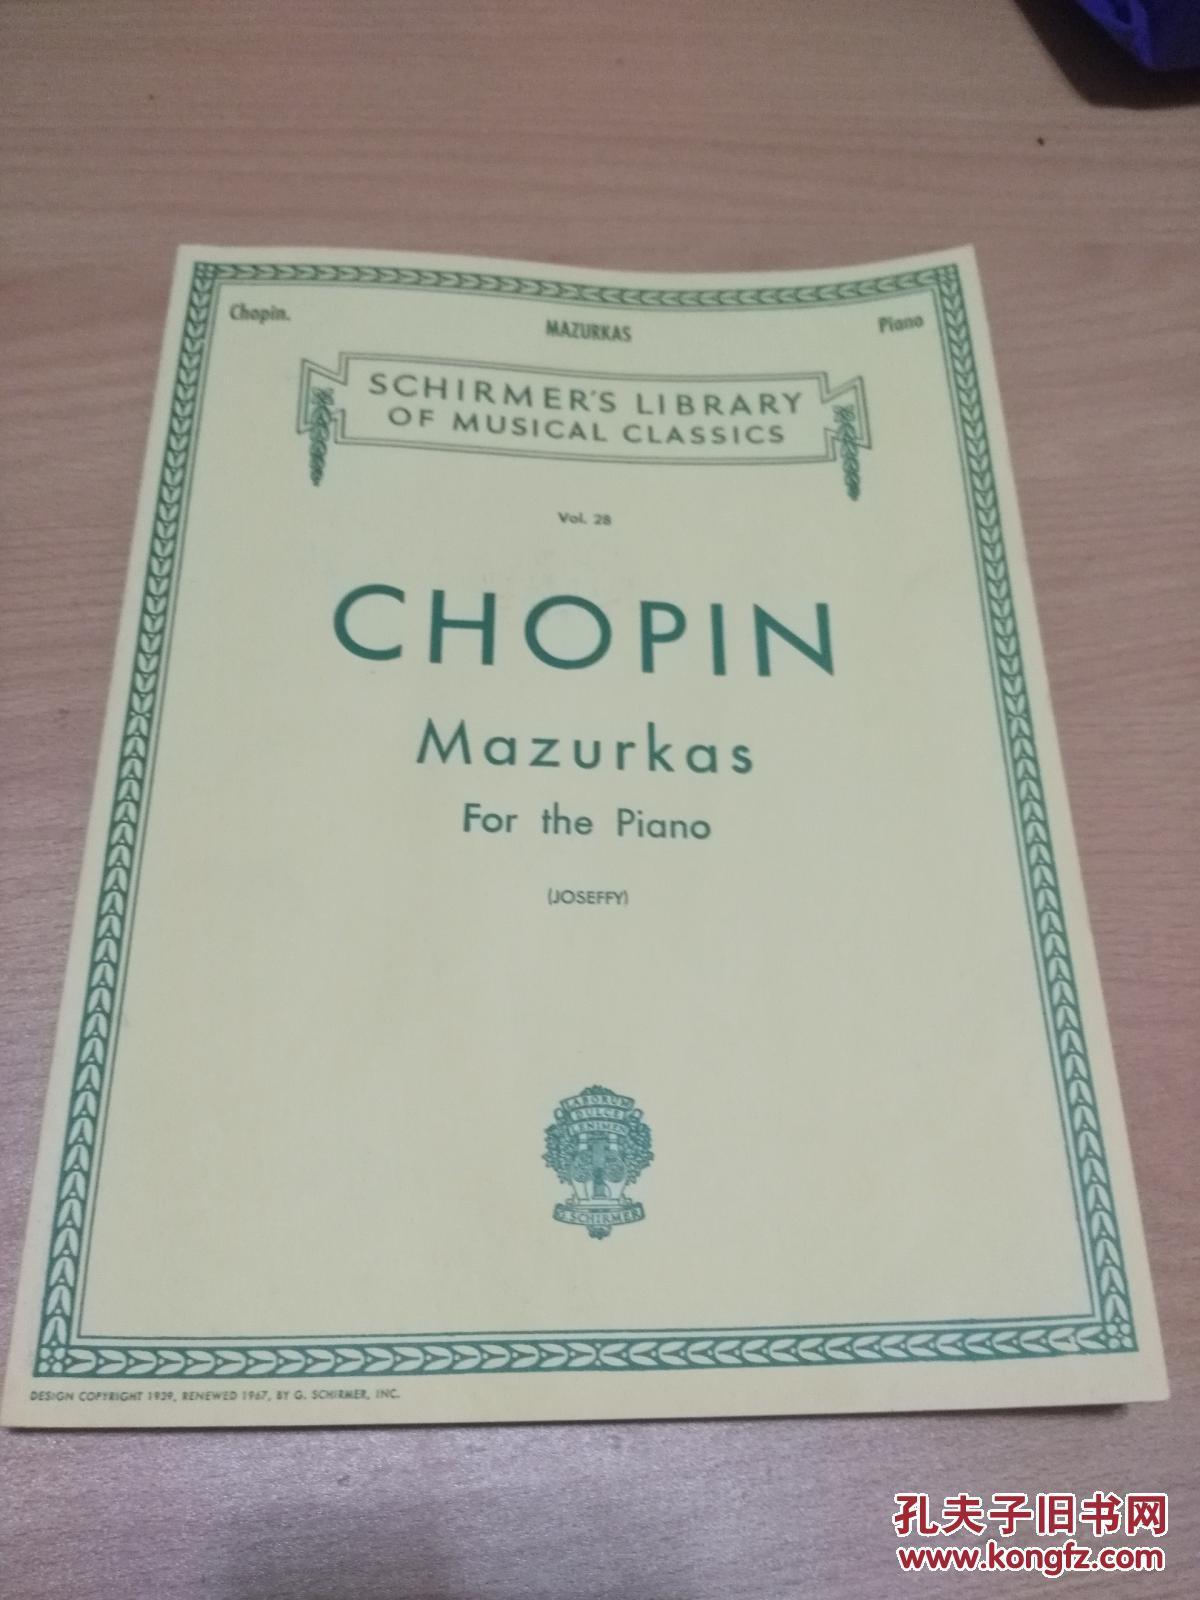 英文原版:CHOPIN. MAZURKAS . FOR THE PIANO(JOSEFFY)肖邦玛祖卡舞曲